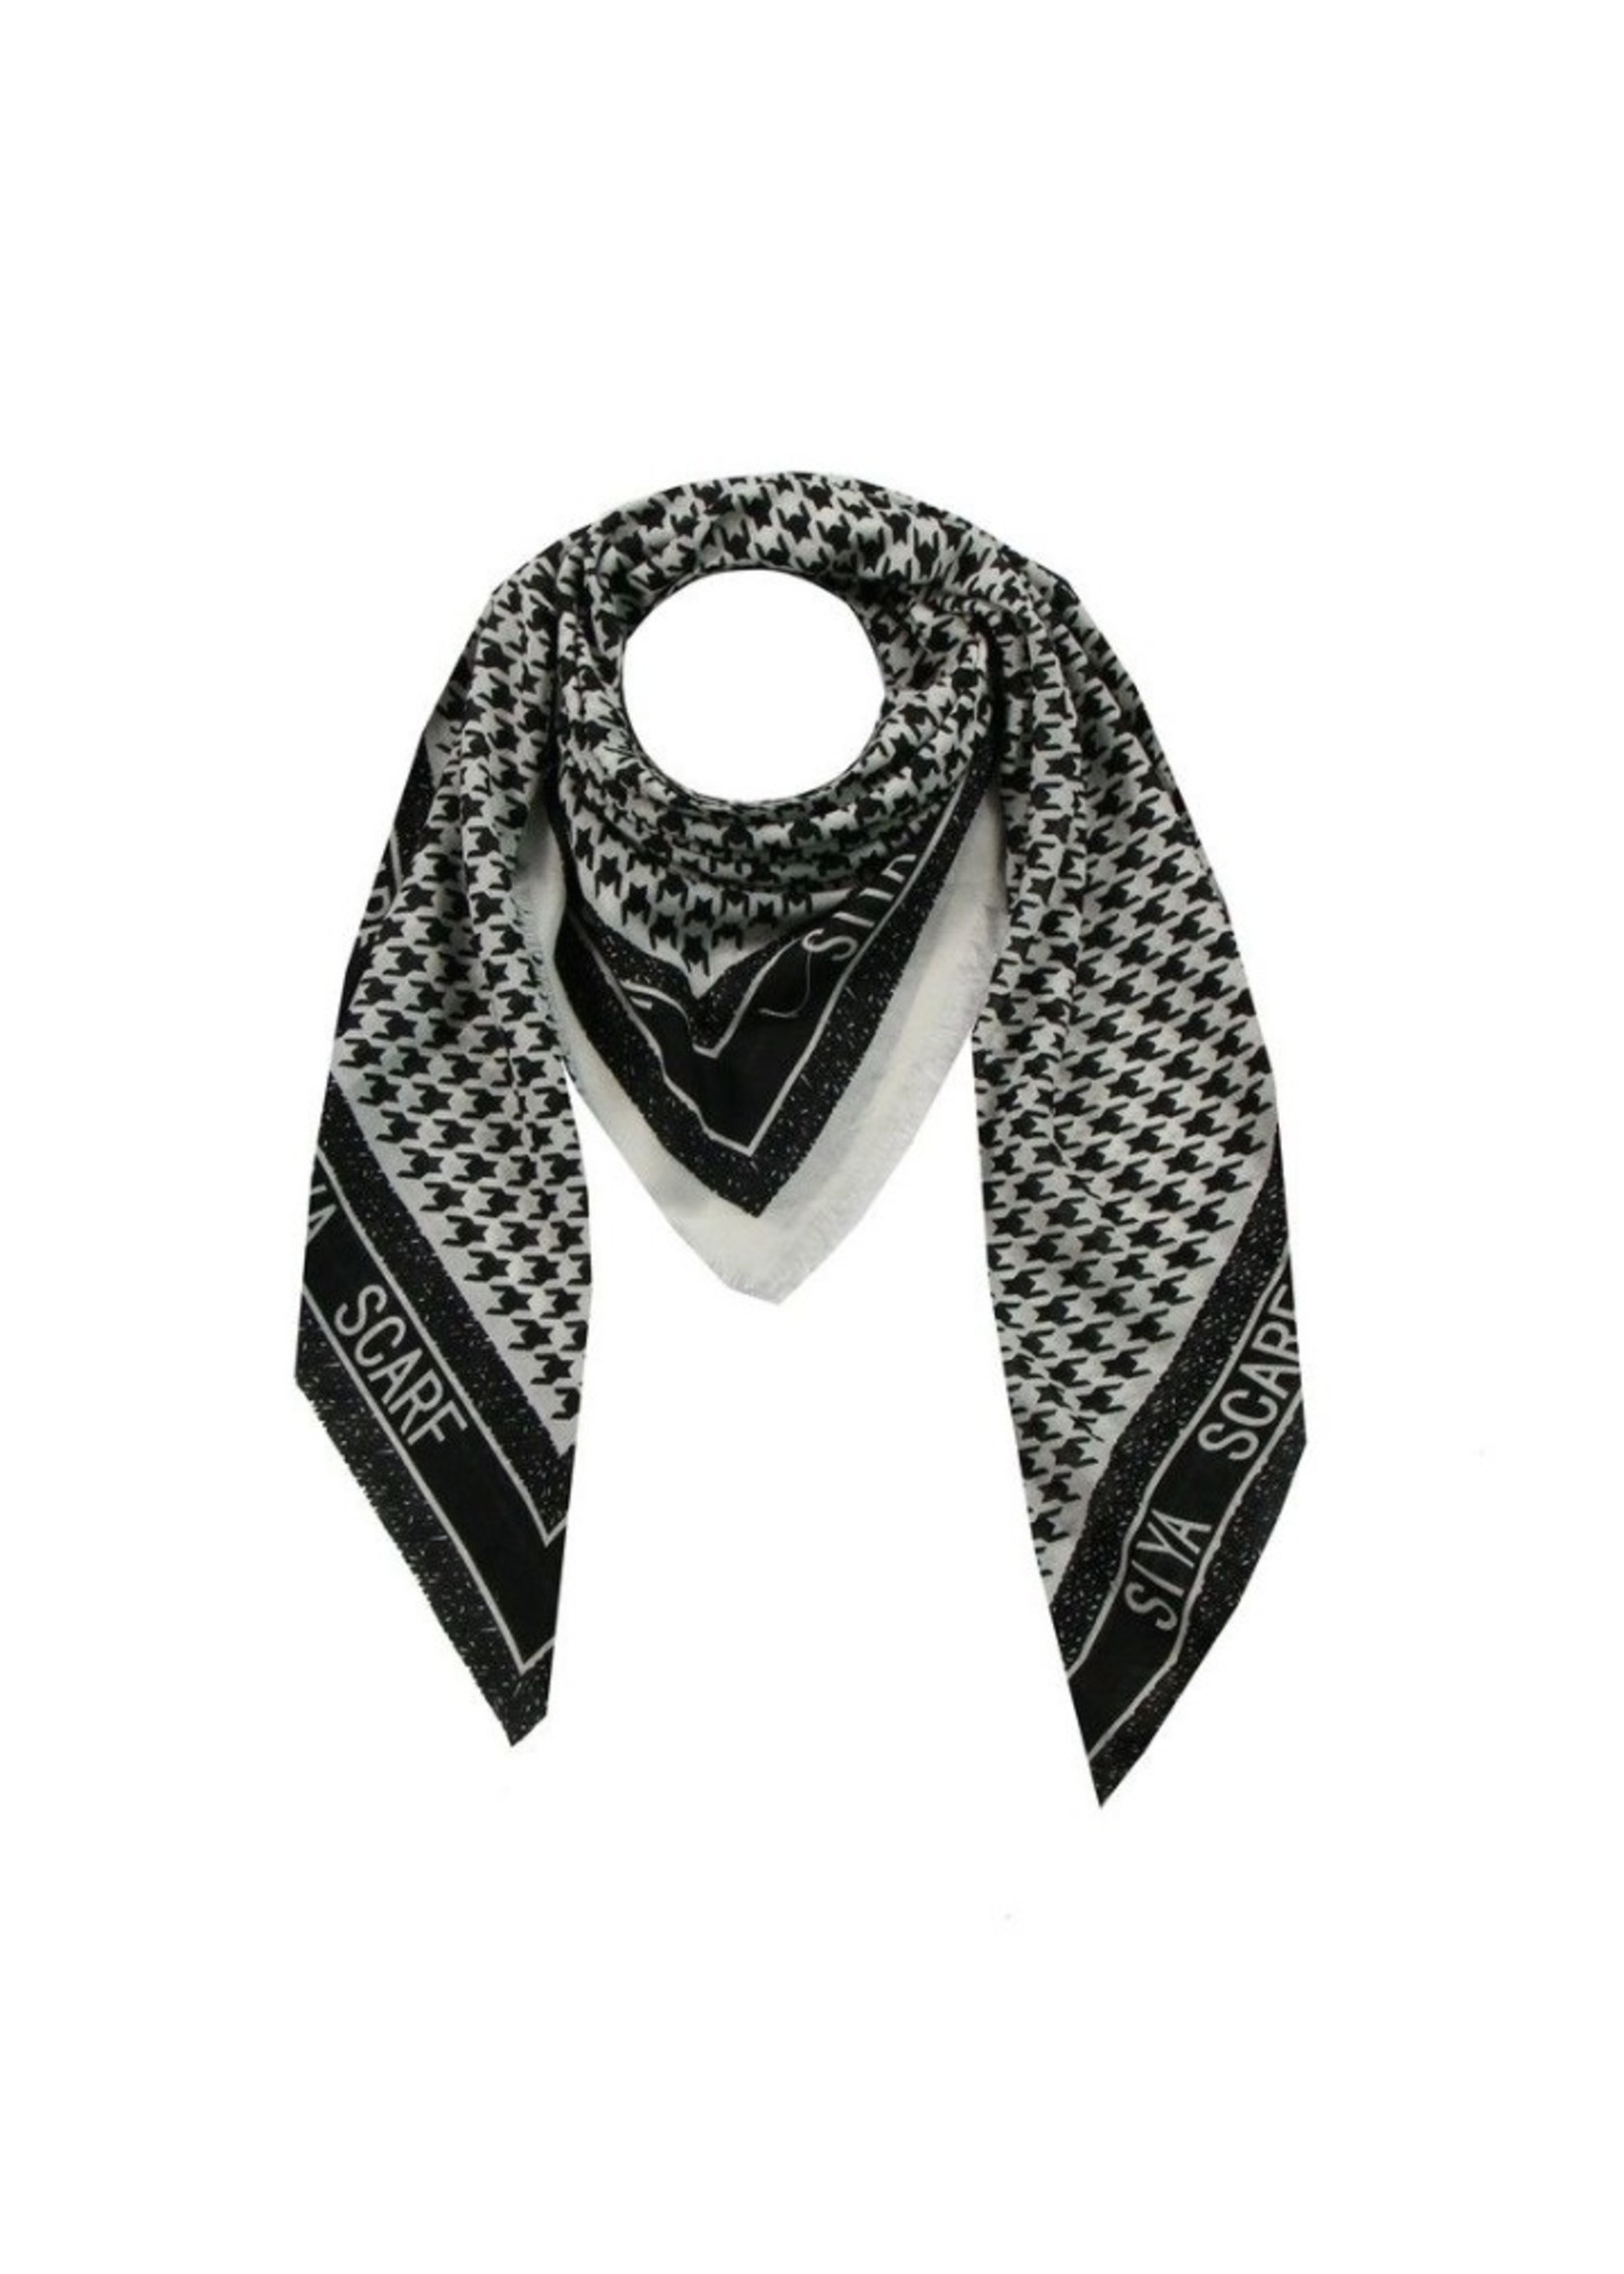 Black & White Scarf